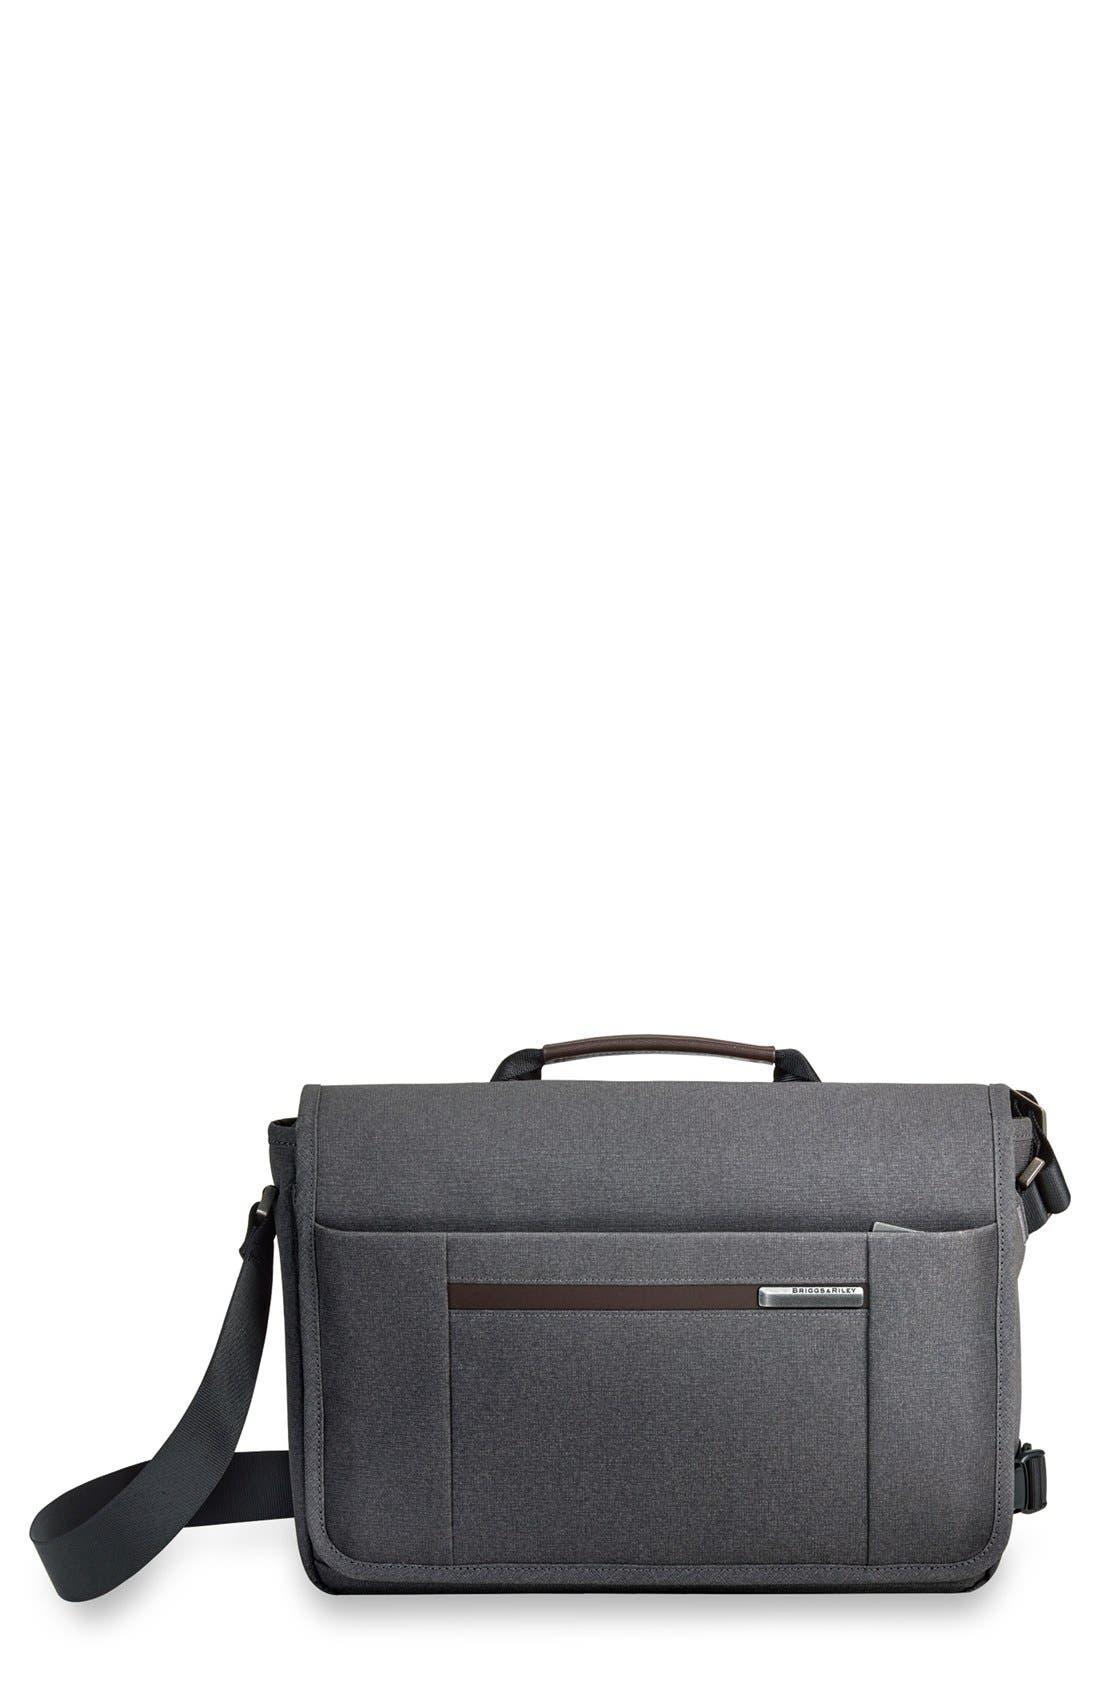 'Kinzie Street - Micro' Messenger Bag,                             Main thumbnail 1, color,                             GREY